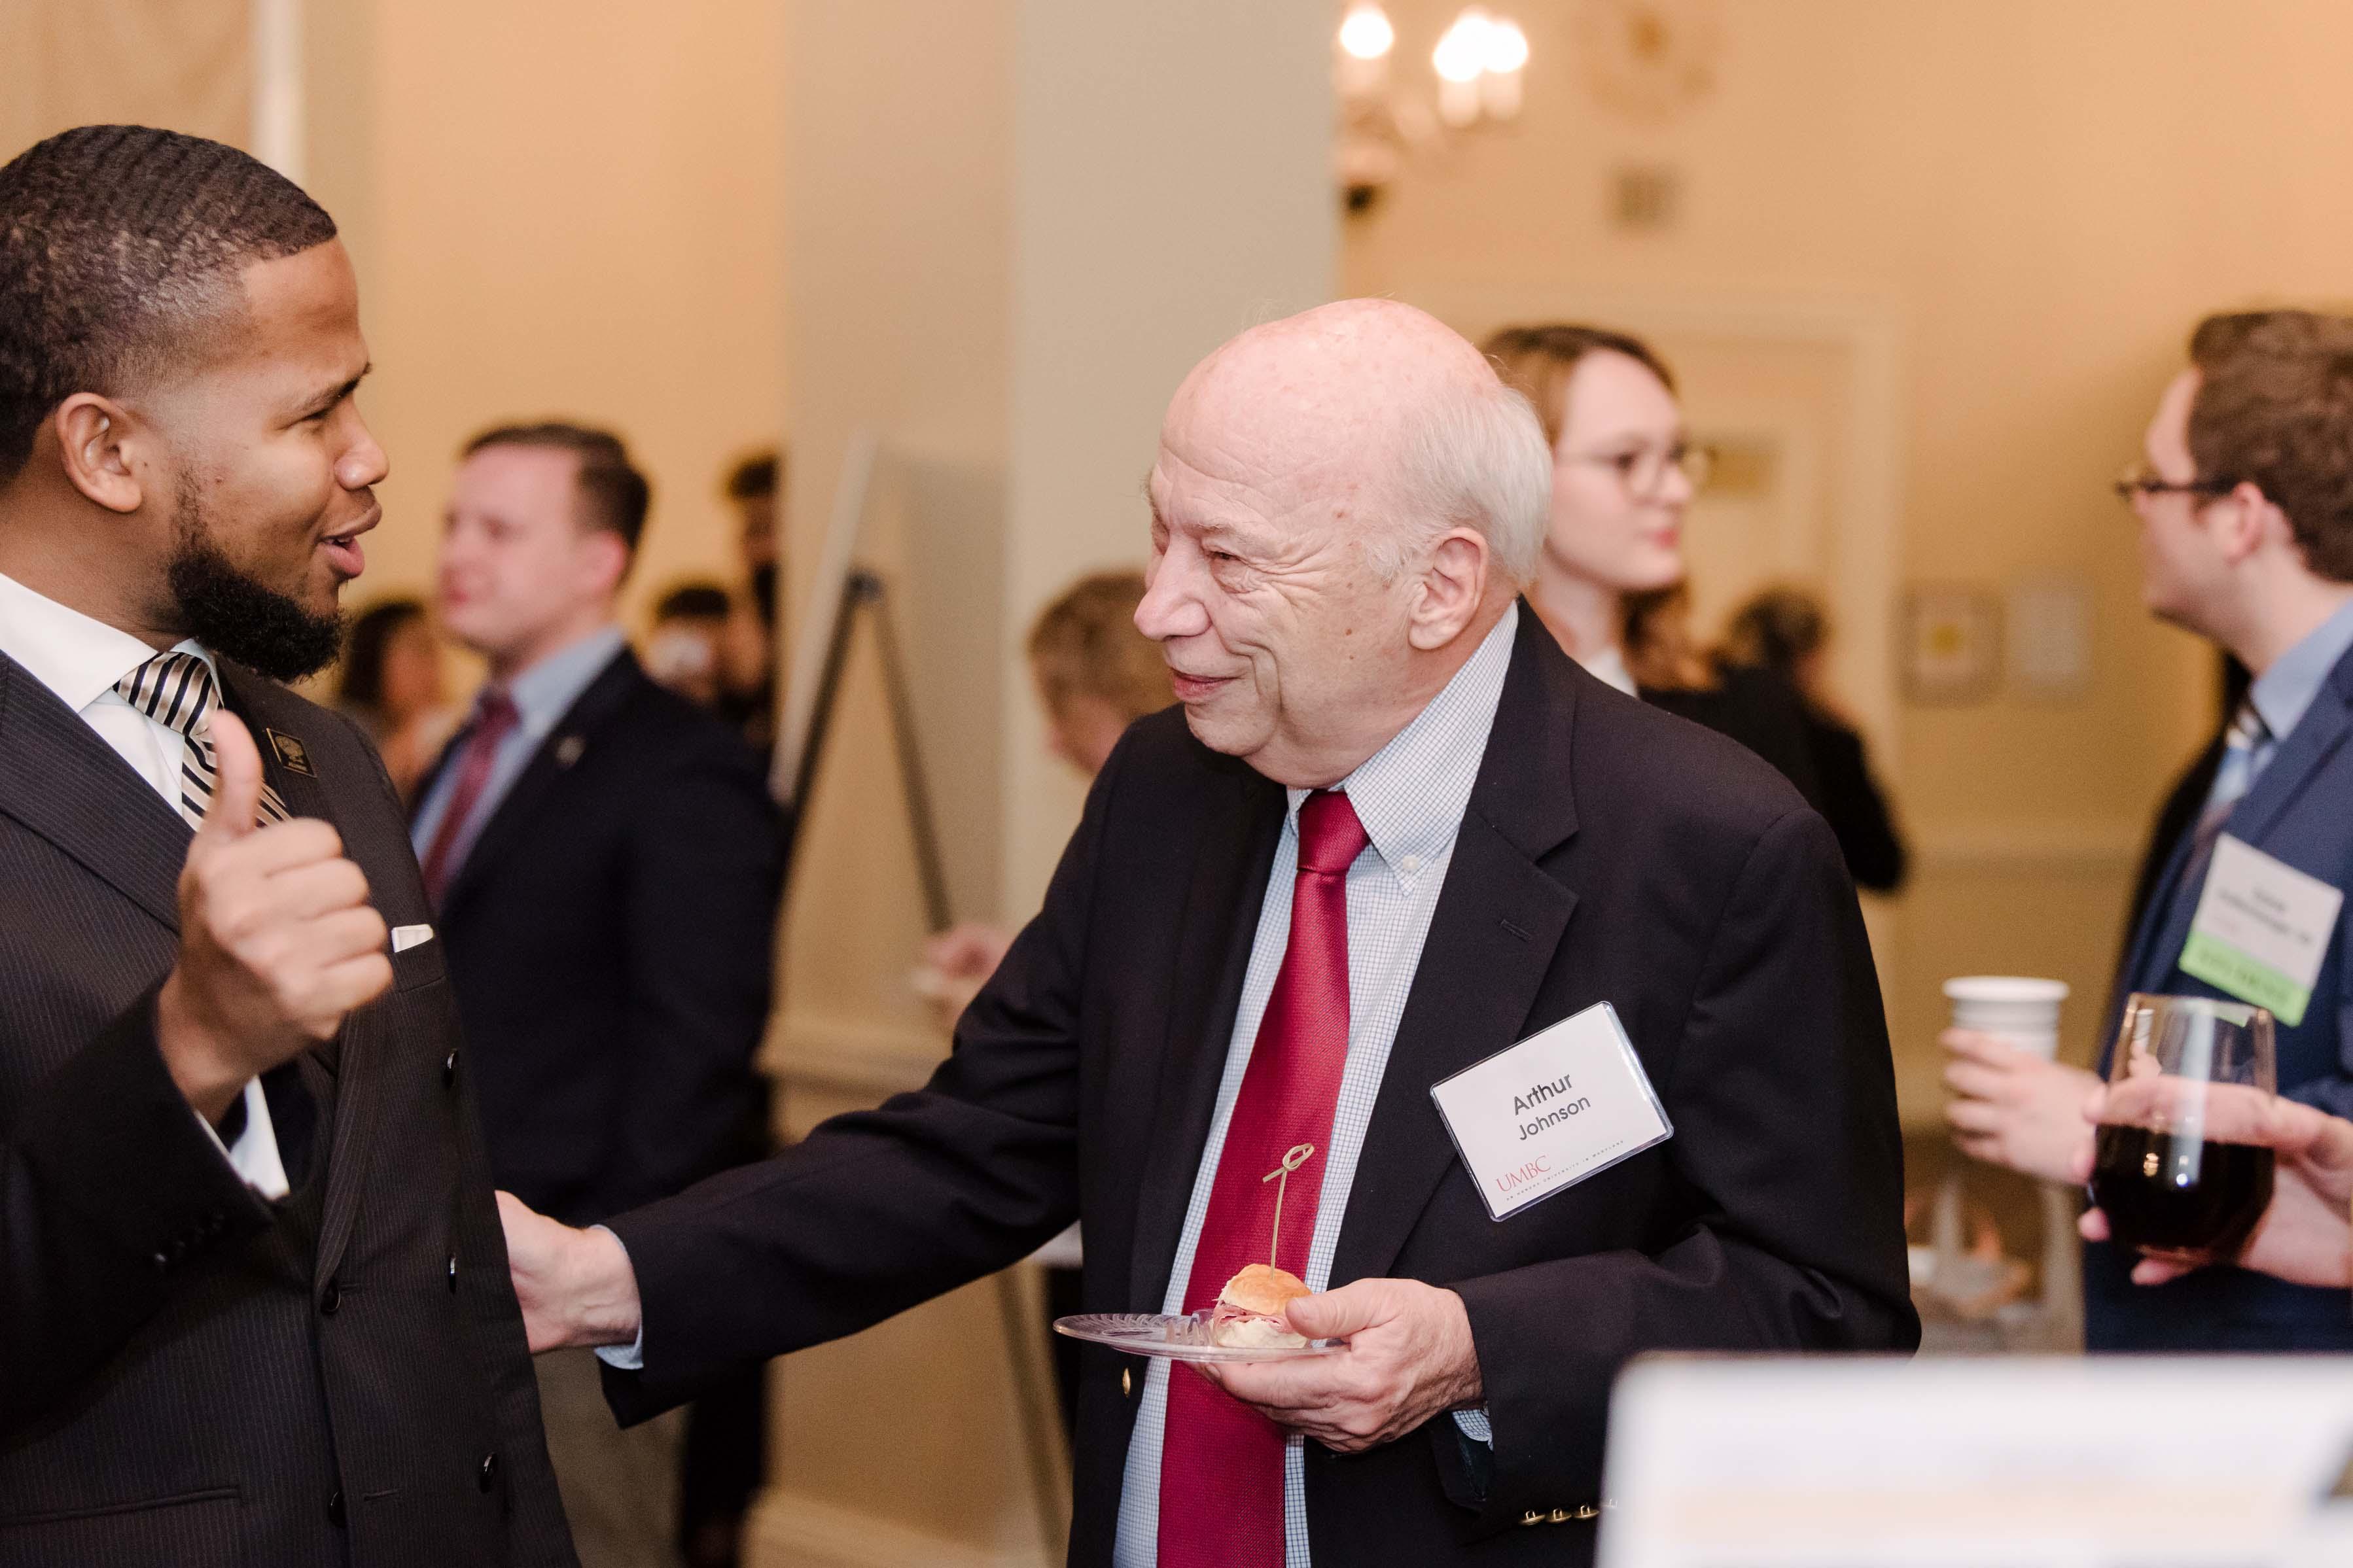 Two men talking animatedly at Annapolis Alumni reception